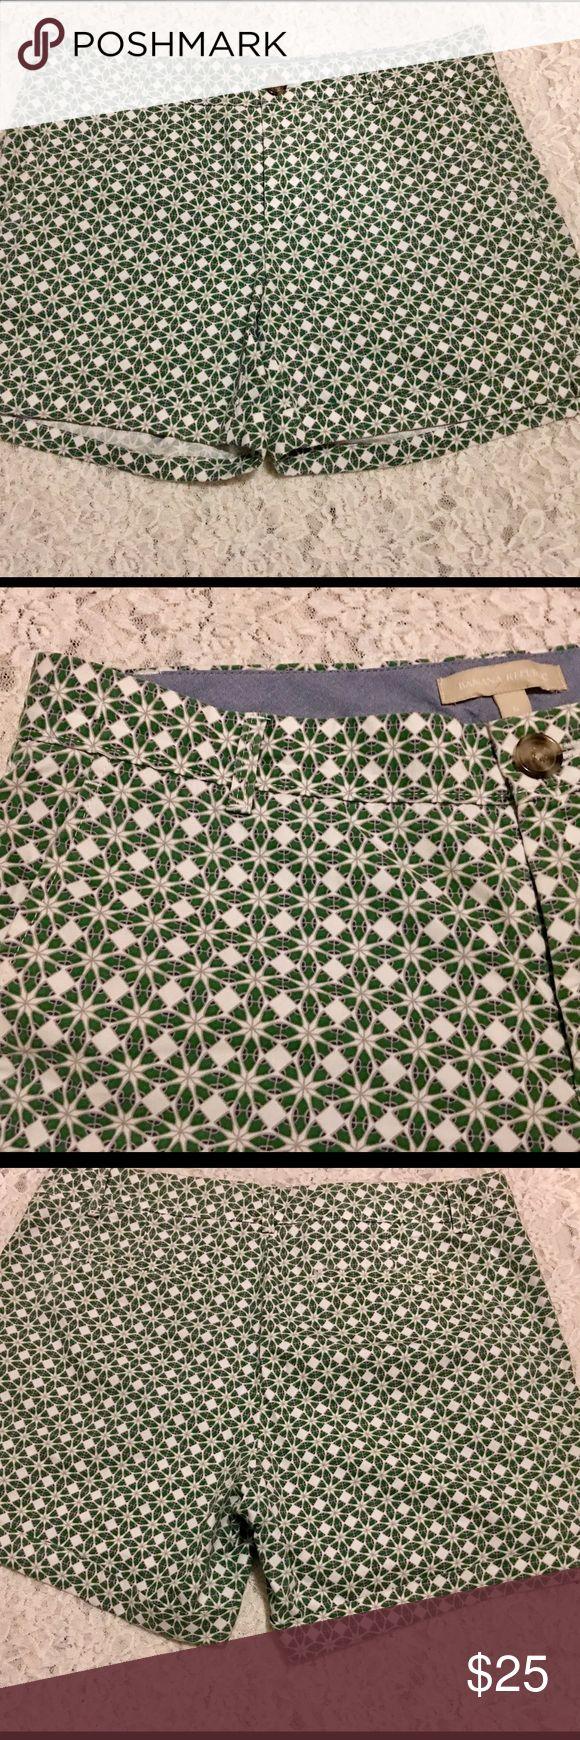 🍌Banana Republic Geometric Shorts Size 6🍌 Banana Republic Geometric Cuffed Shorts in a Size 6 New Without Tags. Great Pair of Shorts With No Defects. *Price is firm. Banana Republic Shorts